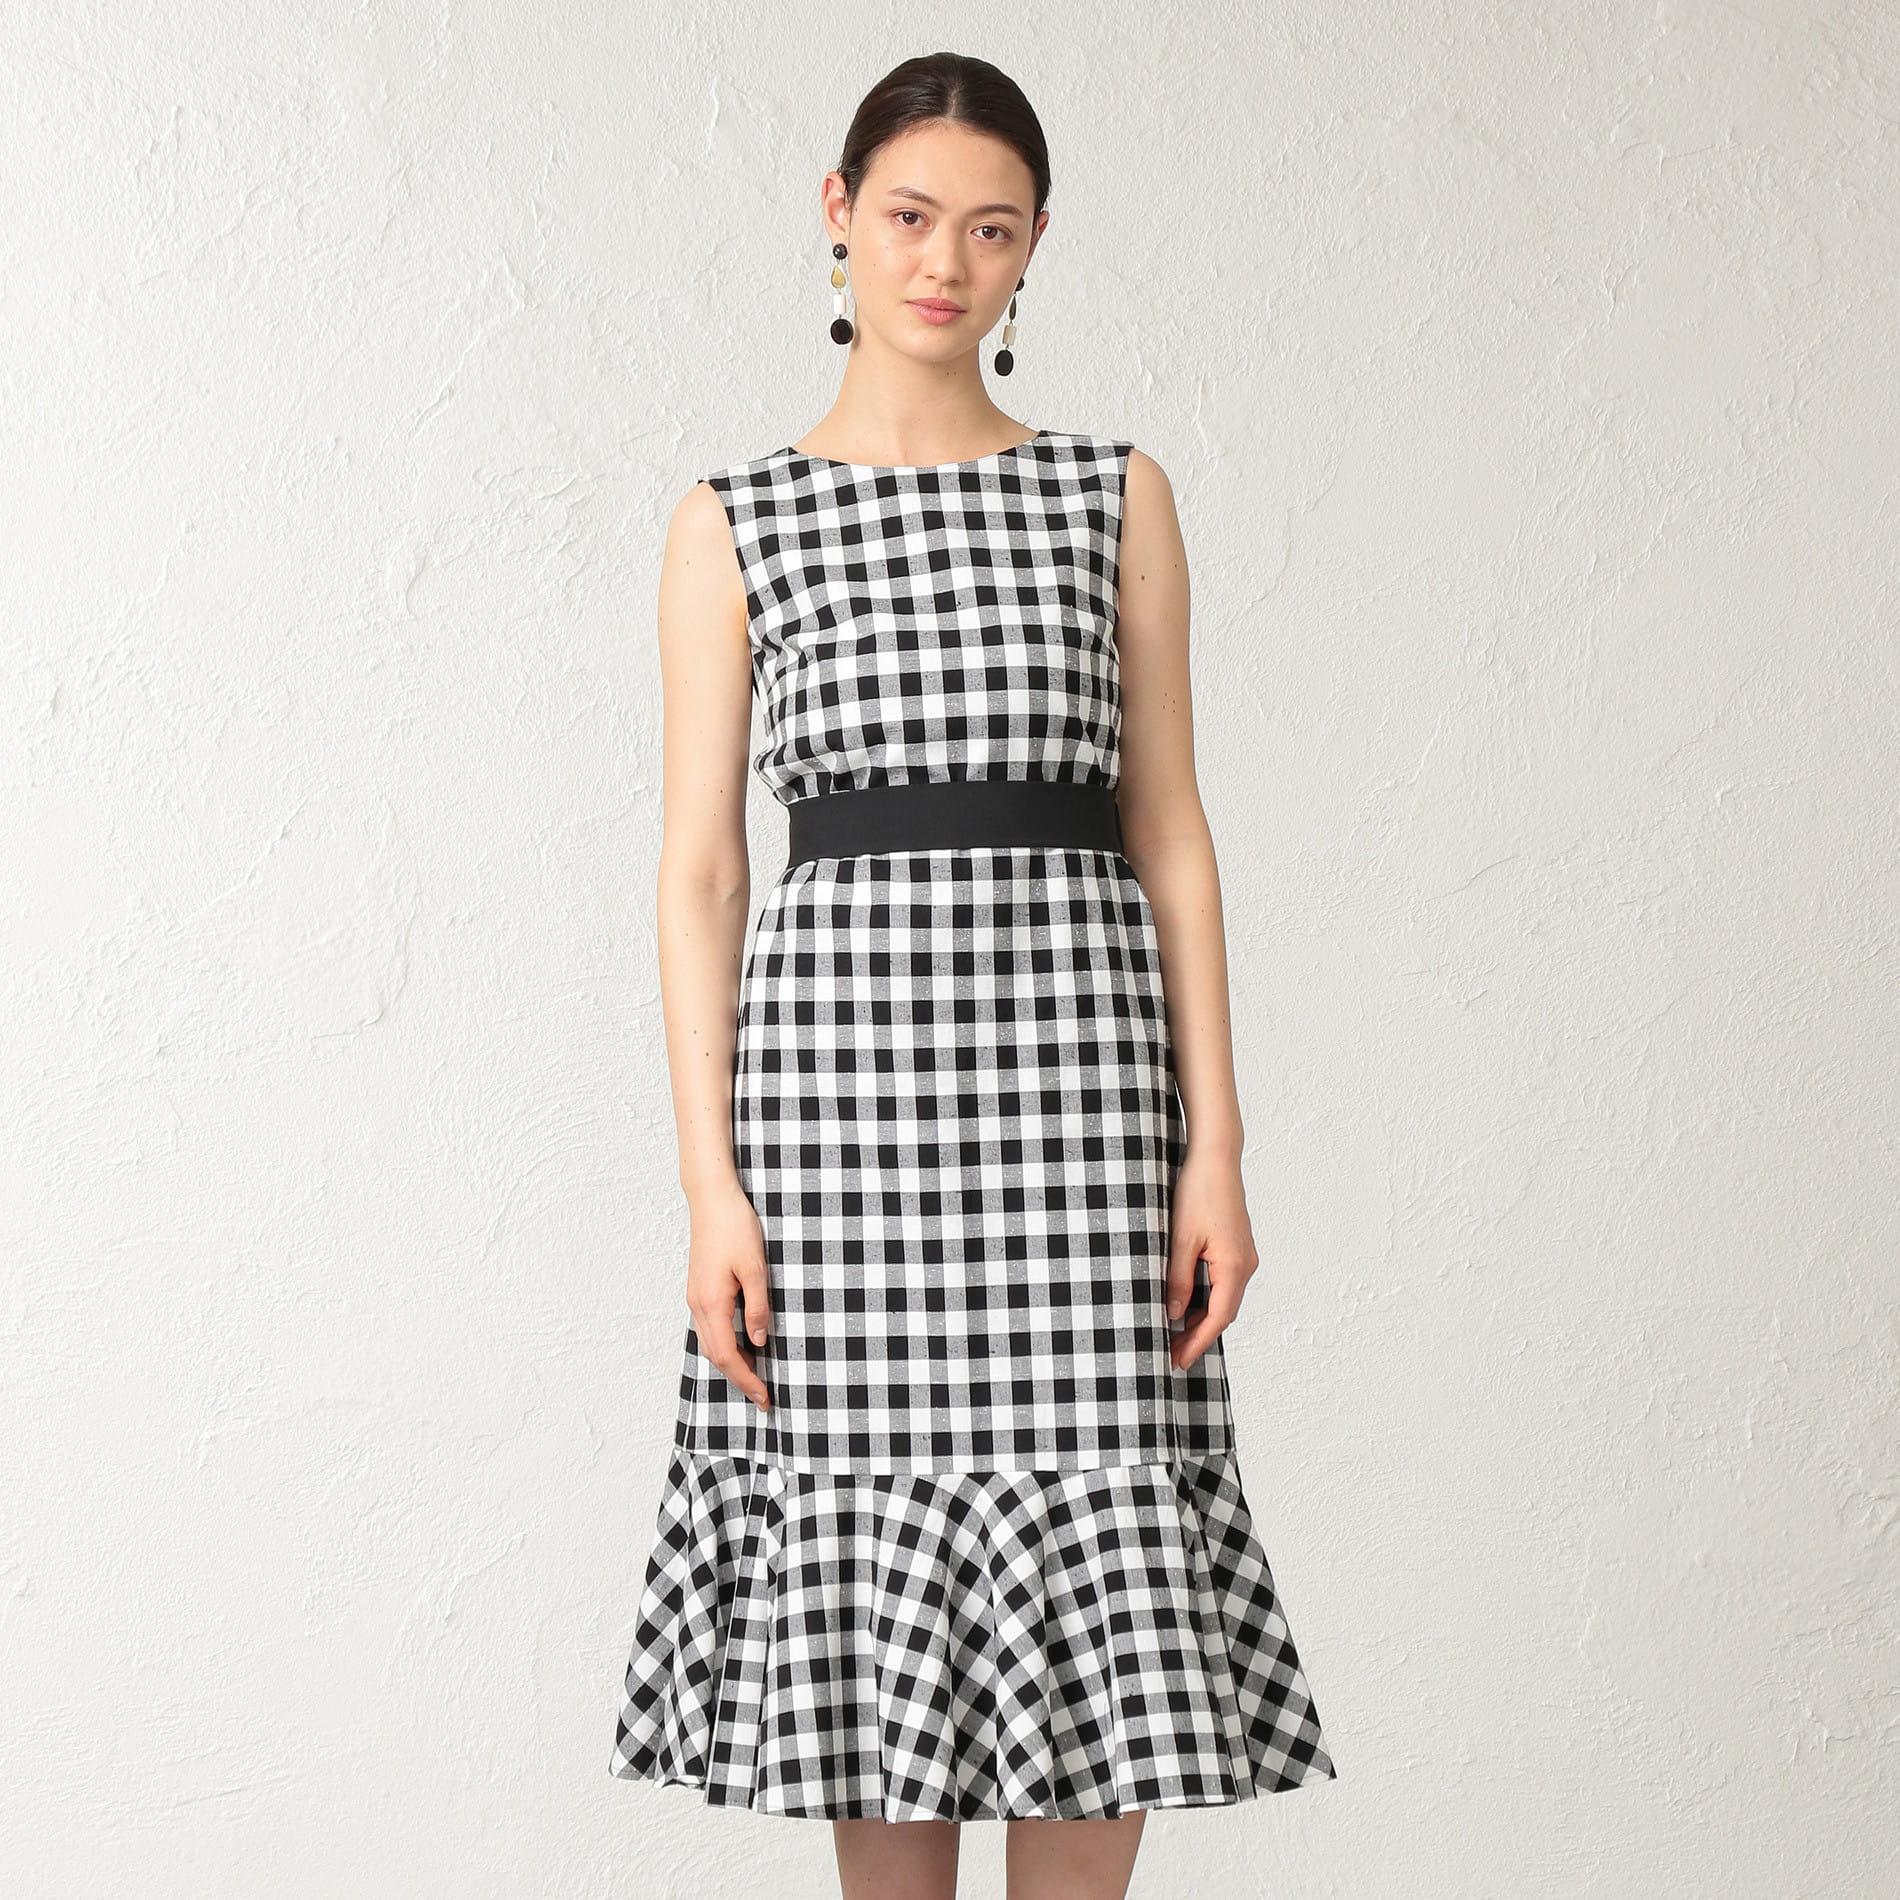 【E_EPOCA THE SHOP】ギンガムチェックドレス